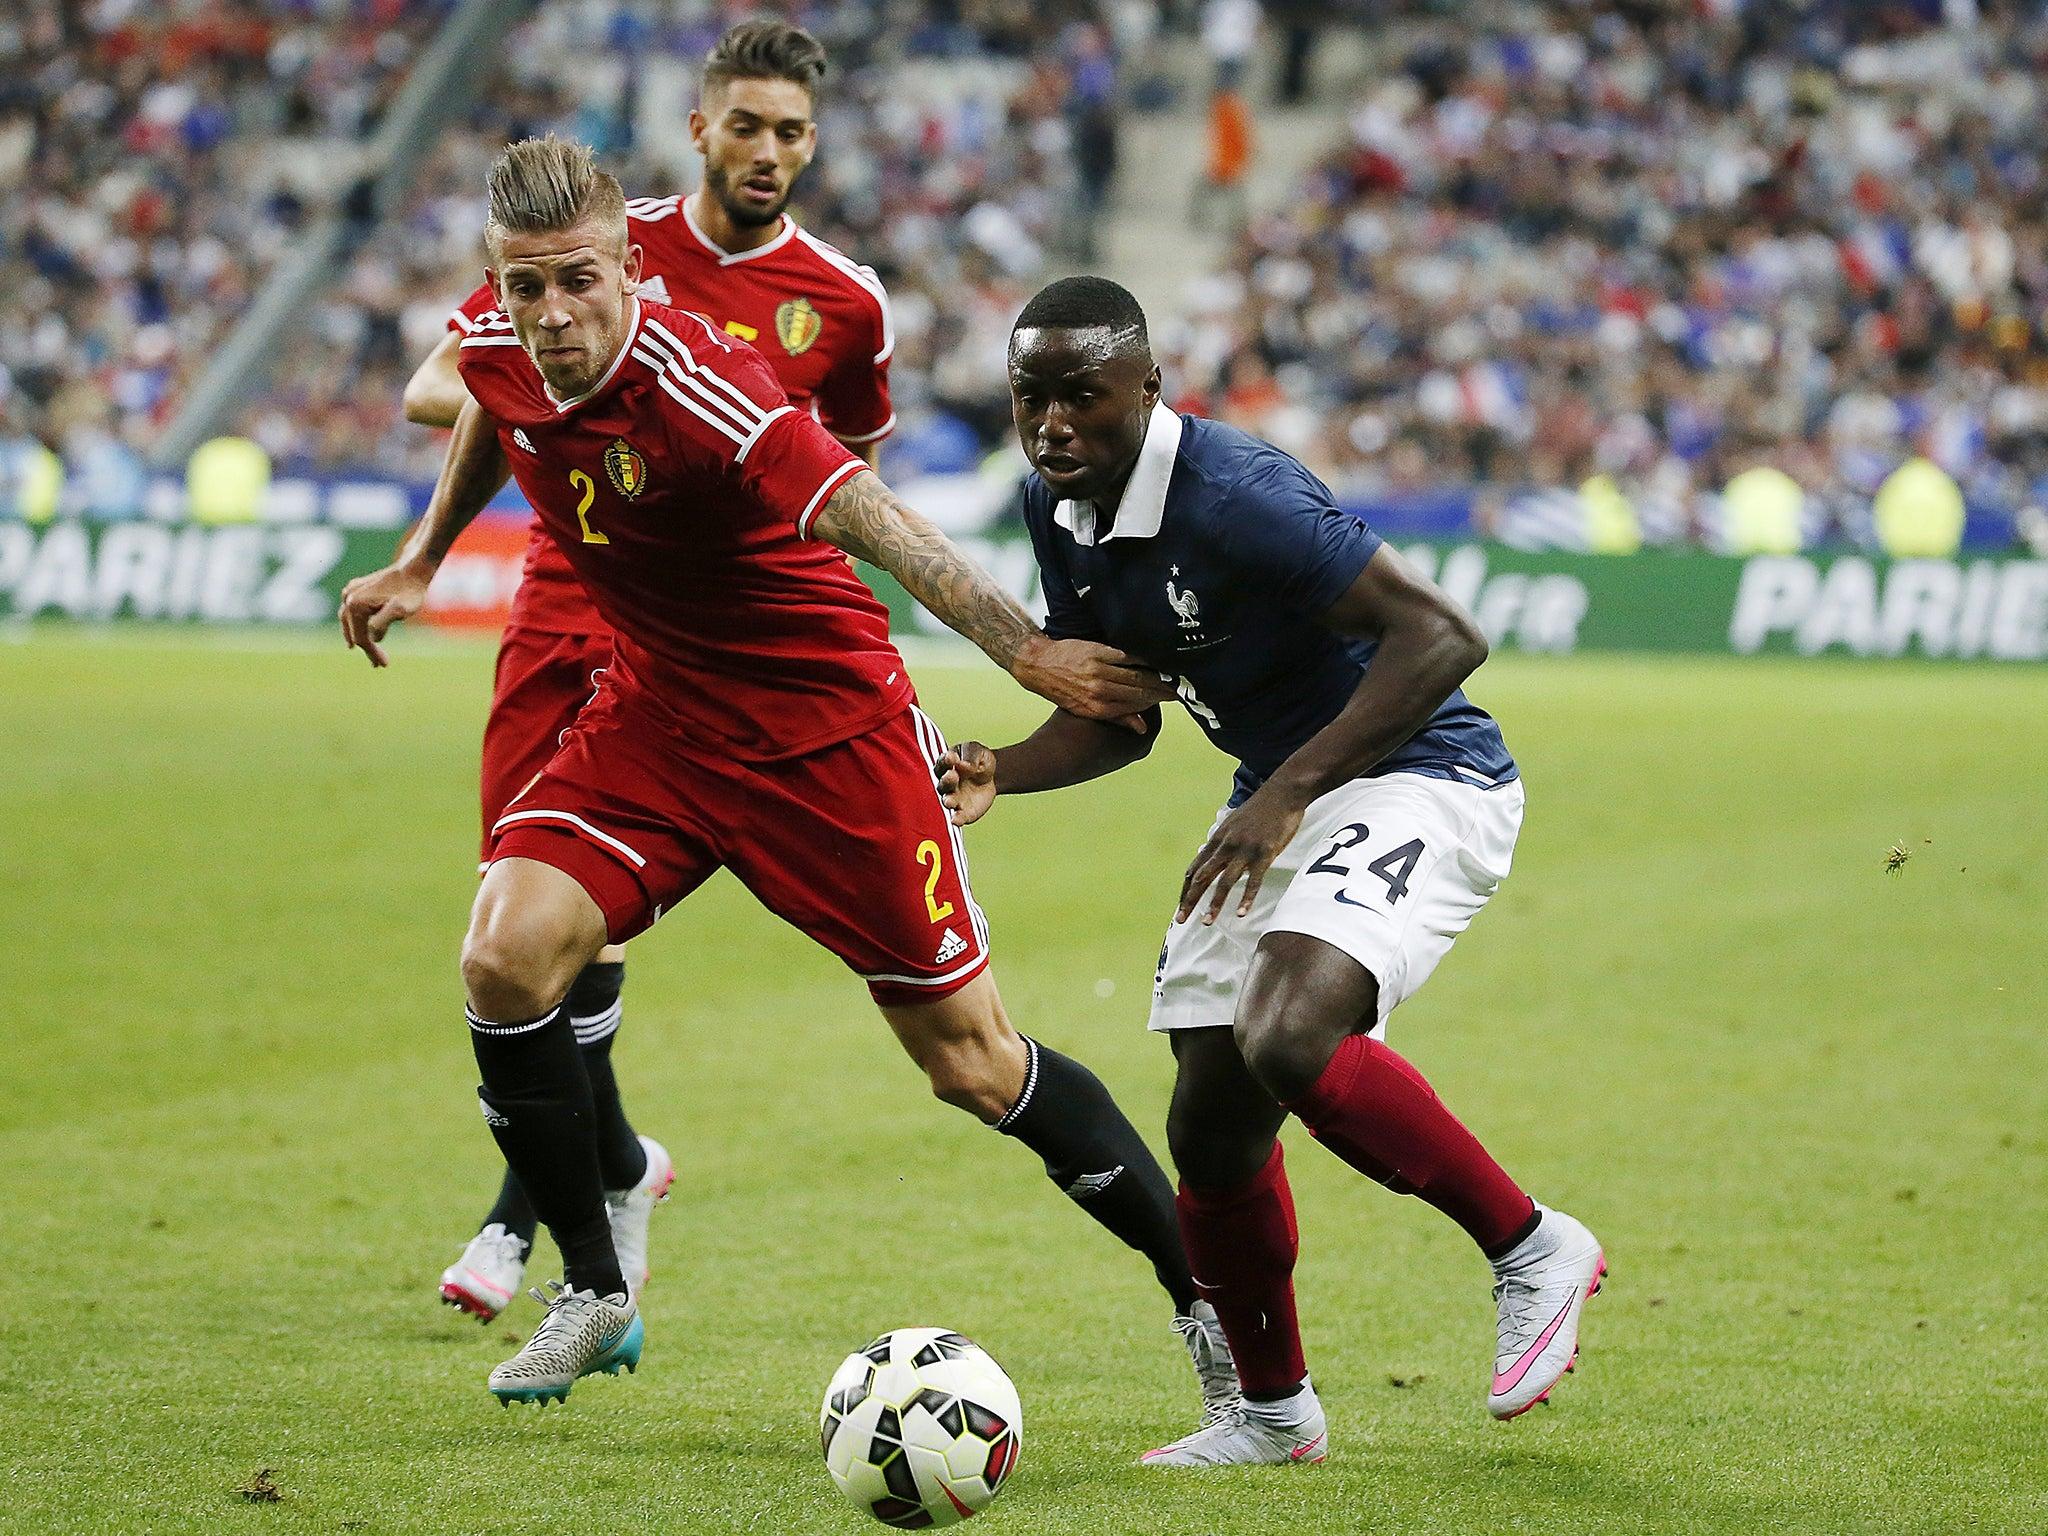 Tottenham transfer news Toby Alderweireld to make imminent move